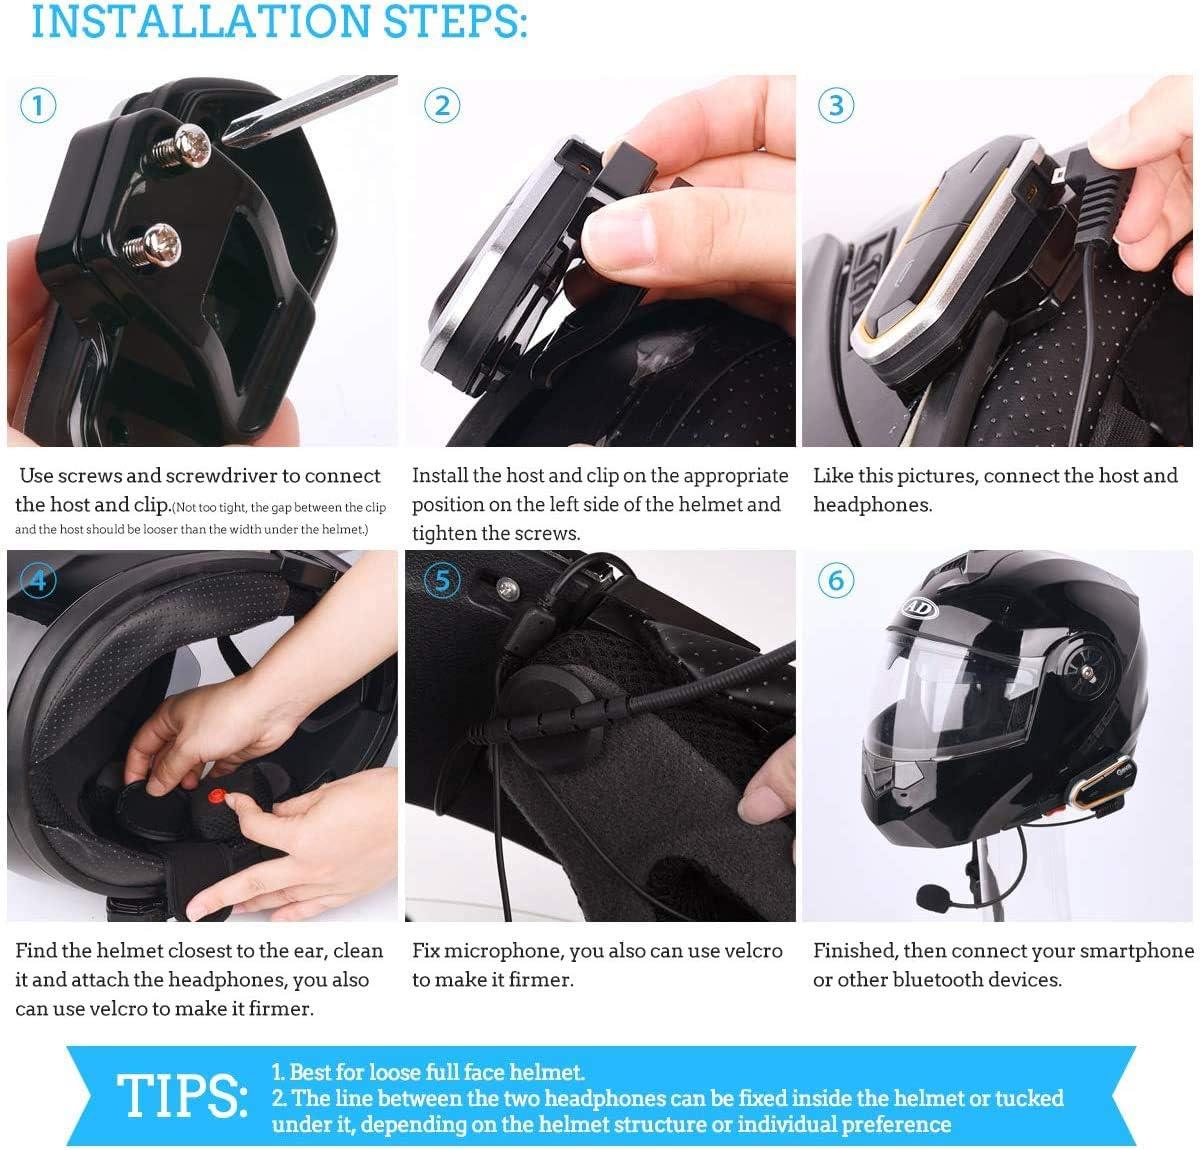 Geva Motorcycle Wireless Headset Motorcycle Intercom Upgrade FM Radio//2 Riders Helmet Wireless Headset 1090 Yards Intercom Range//Voice Dial//Automatic Answering//Broadcasting Phone Number//HD Stereo